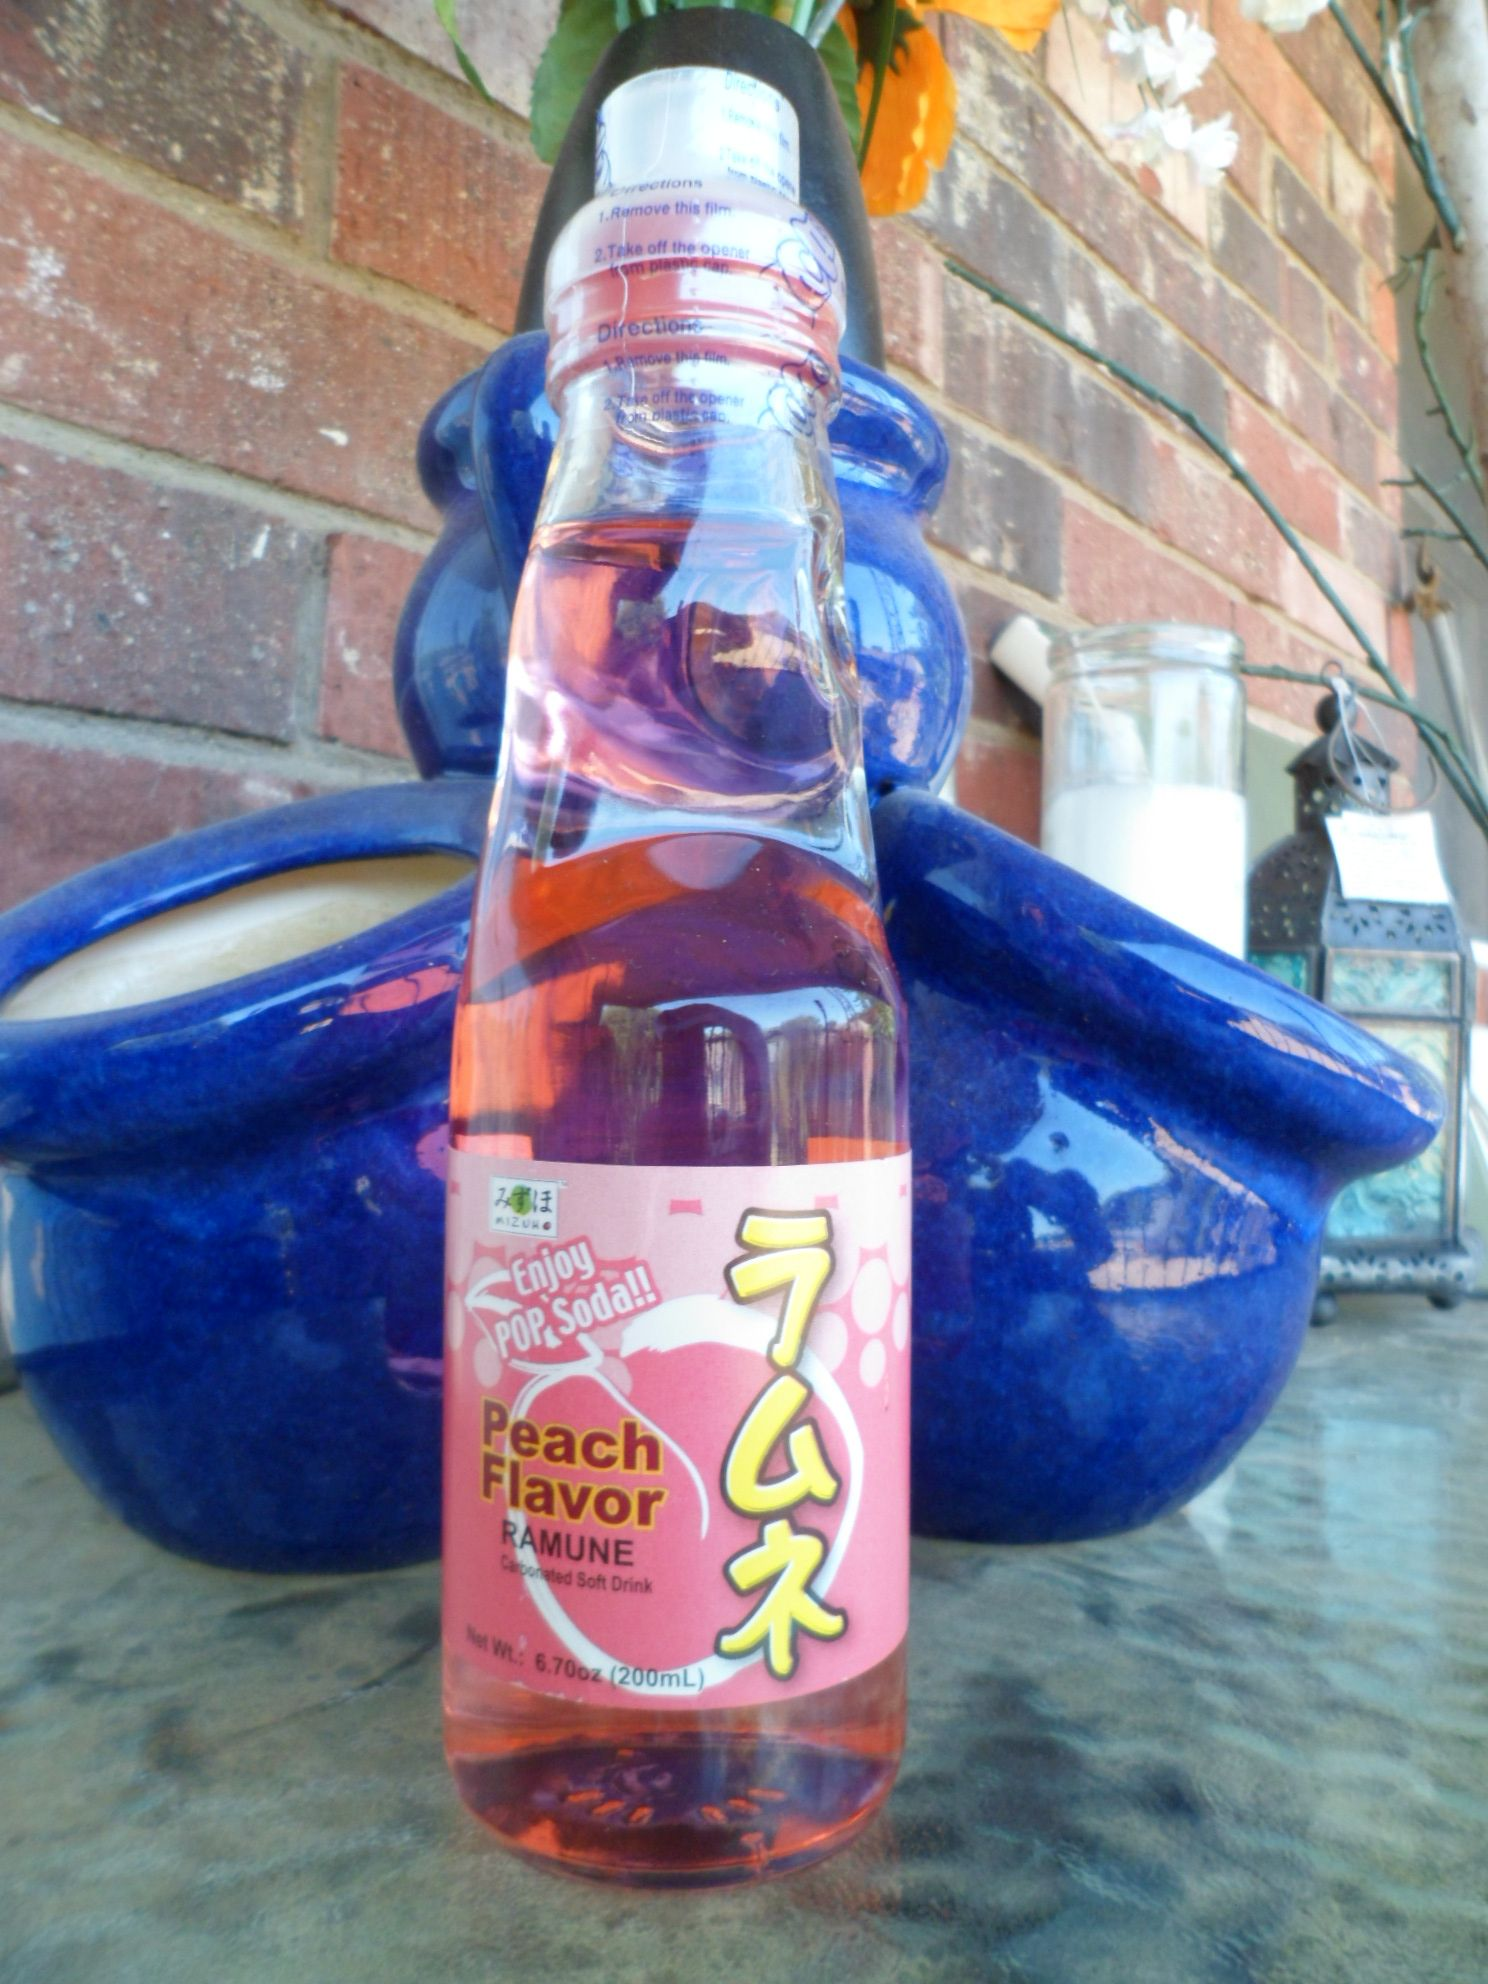 Pop Soda Peach Flavor Ramune Carbonated Soft Drink